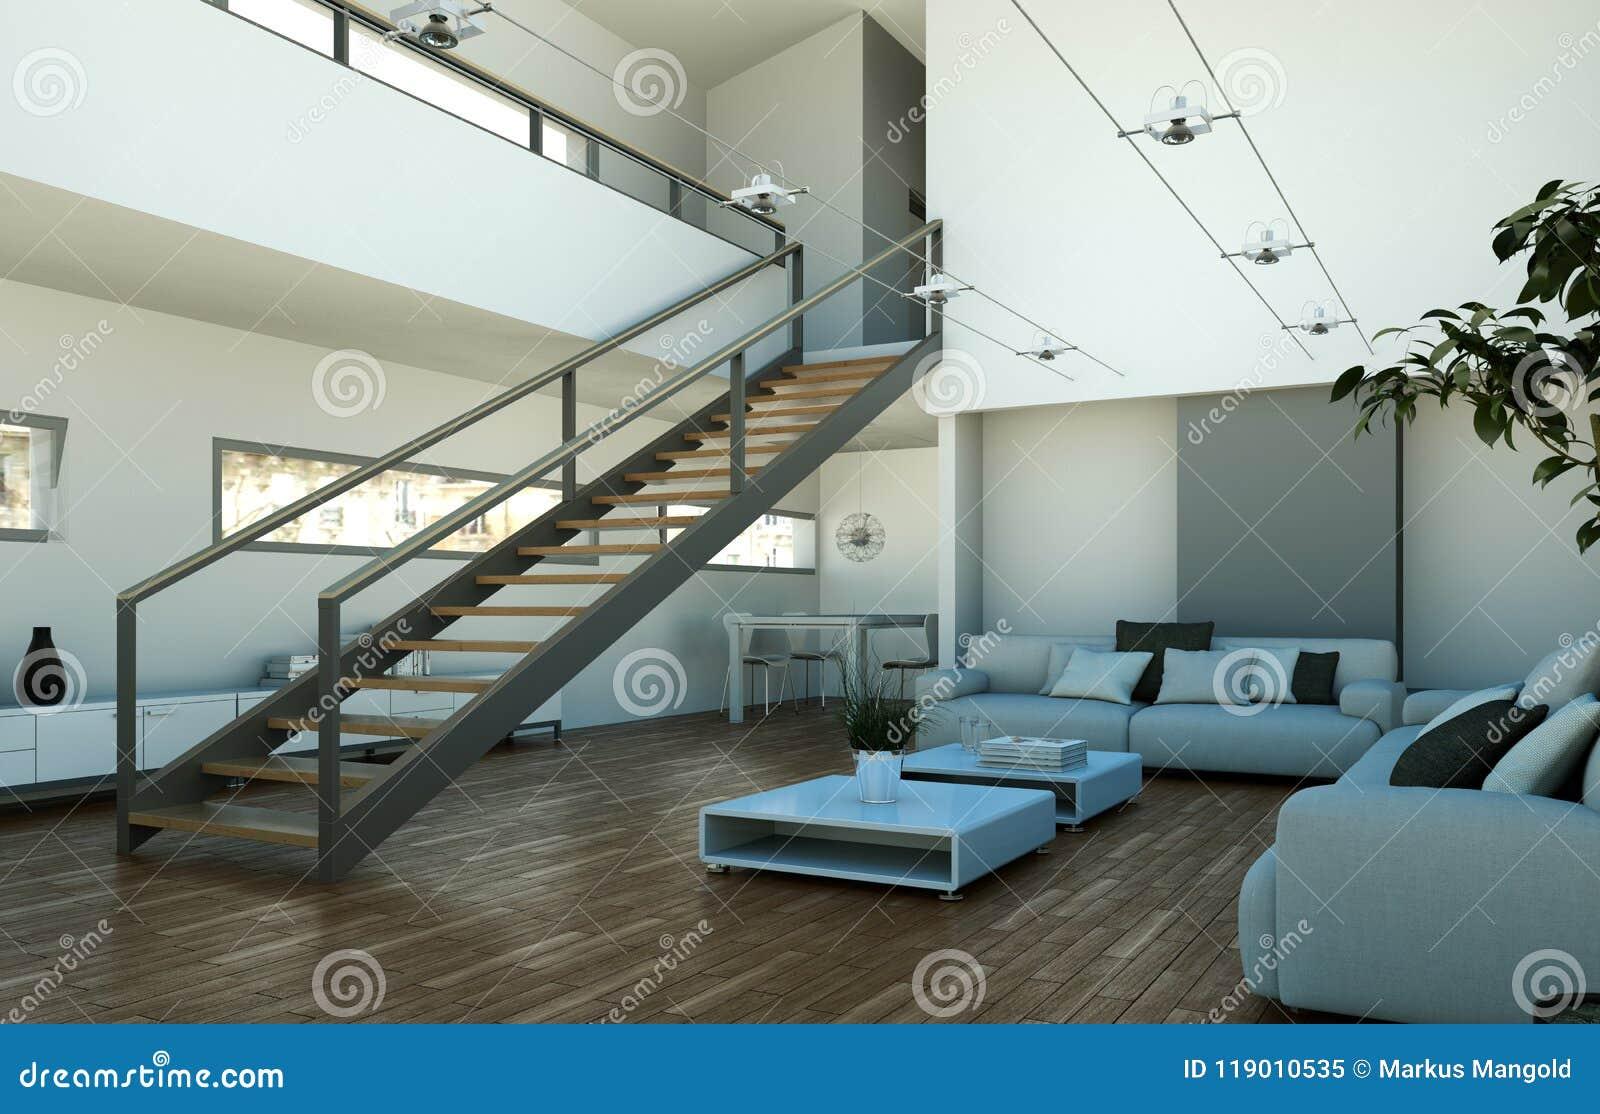 modern bright loft interior design with stairway to second floor rh dreamstime com